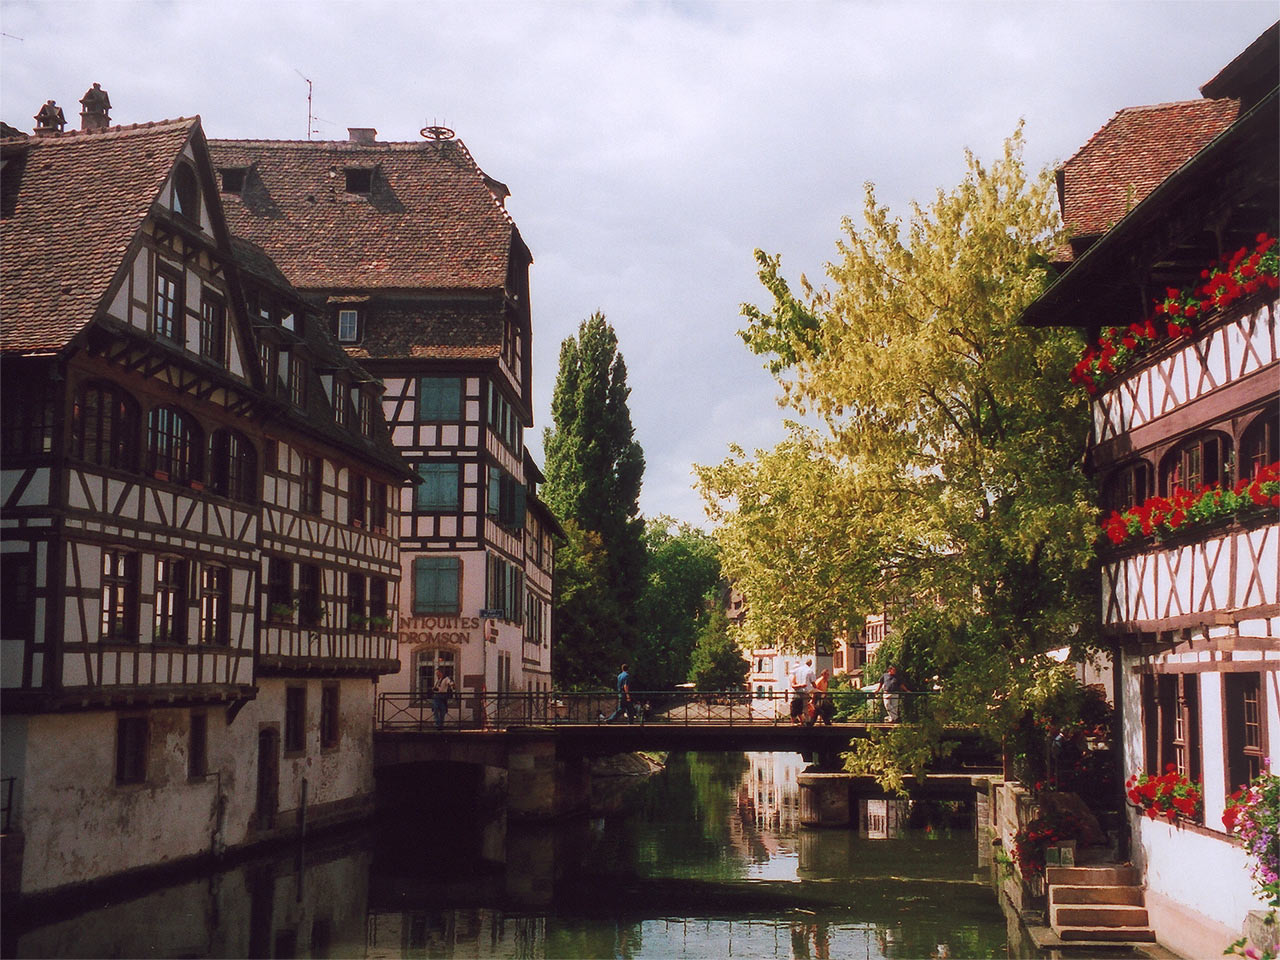 Gite De France Vill Ef Bf Bd Alsace